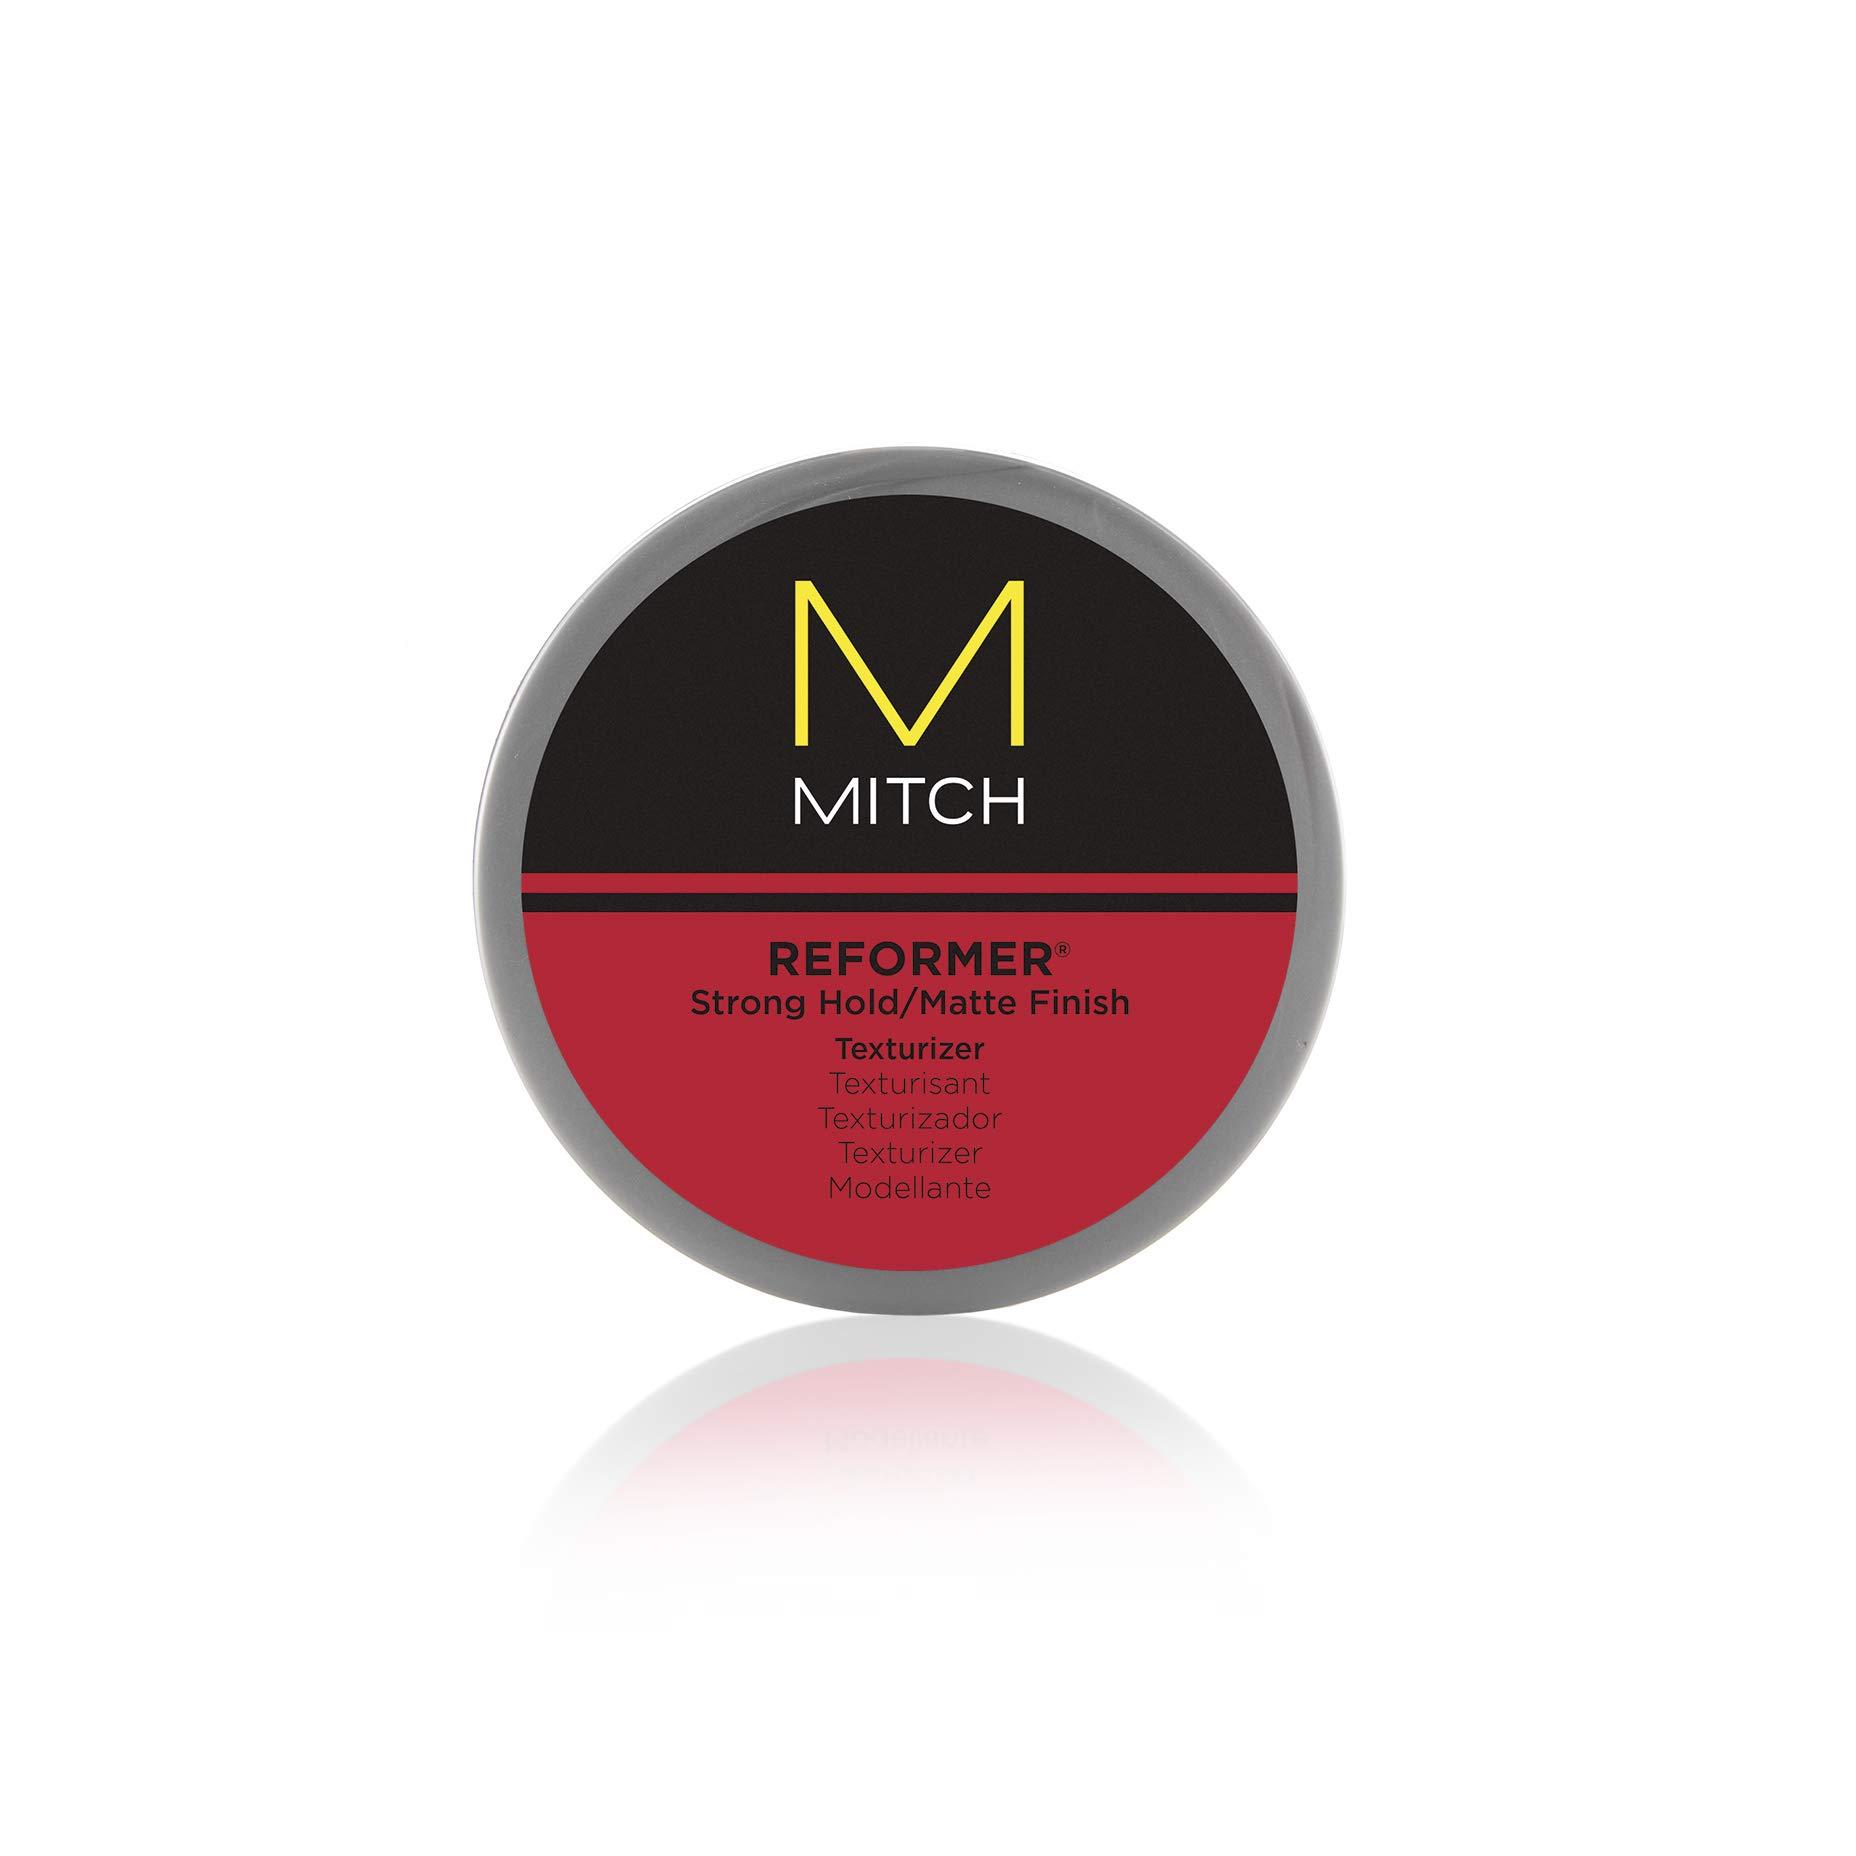 MITCH Reformer Texturizing Hair Putty, 3 oz by Mitch